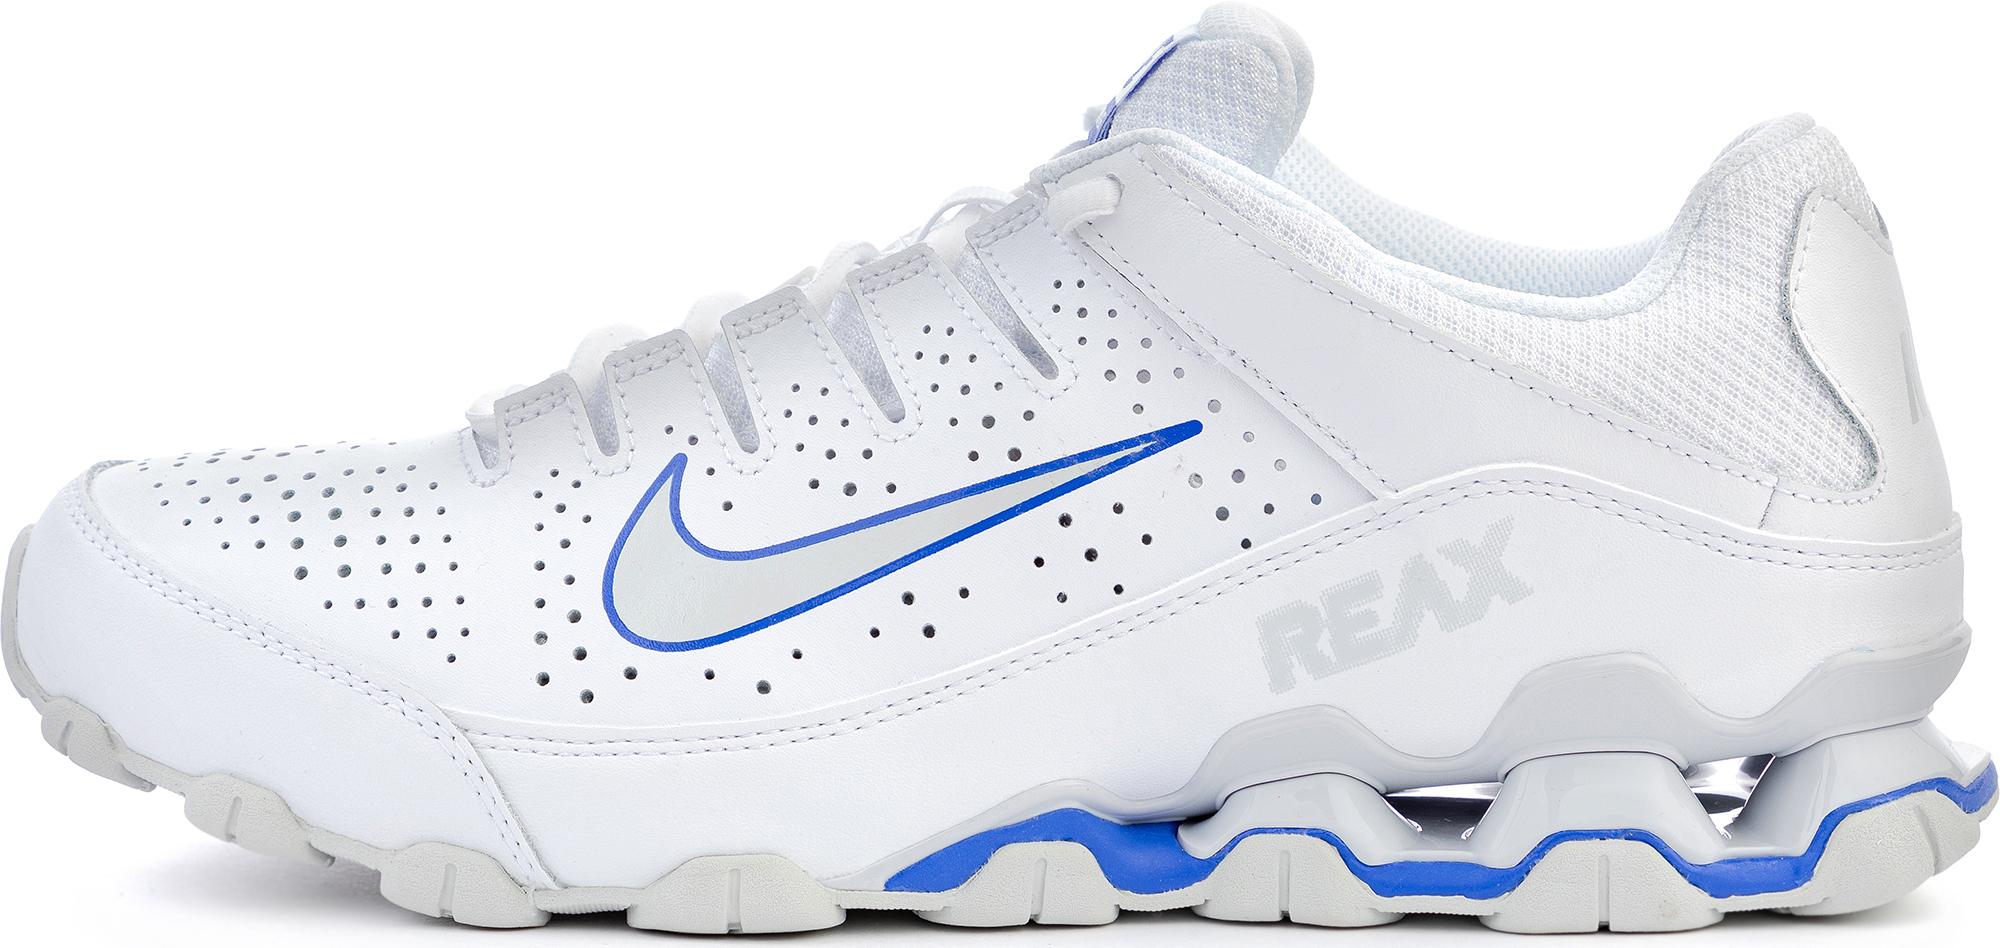 Nike Кроссовки мужские Nike Reax 8 Tr, размер 45 ботинки мужские зимние tr aym 15a синий размер 45